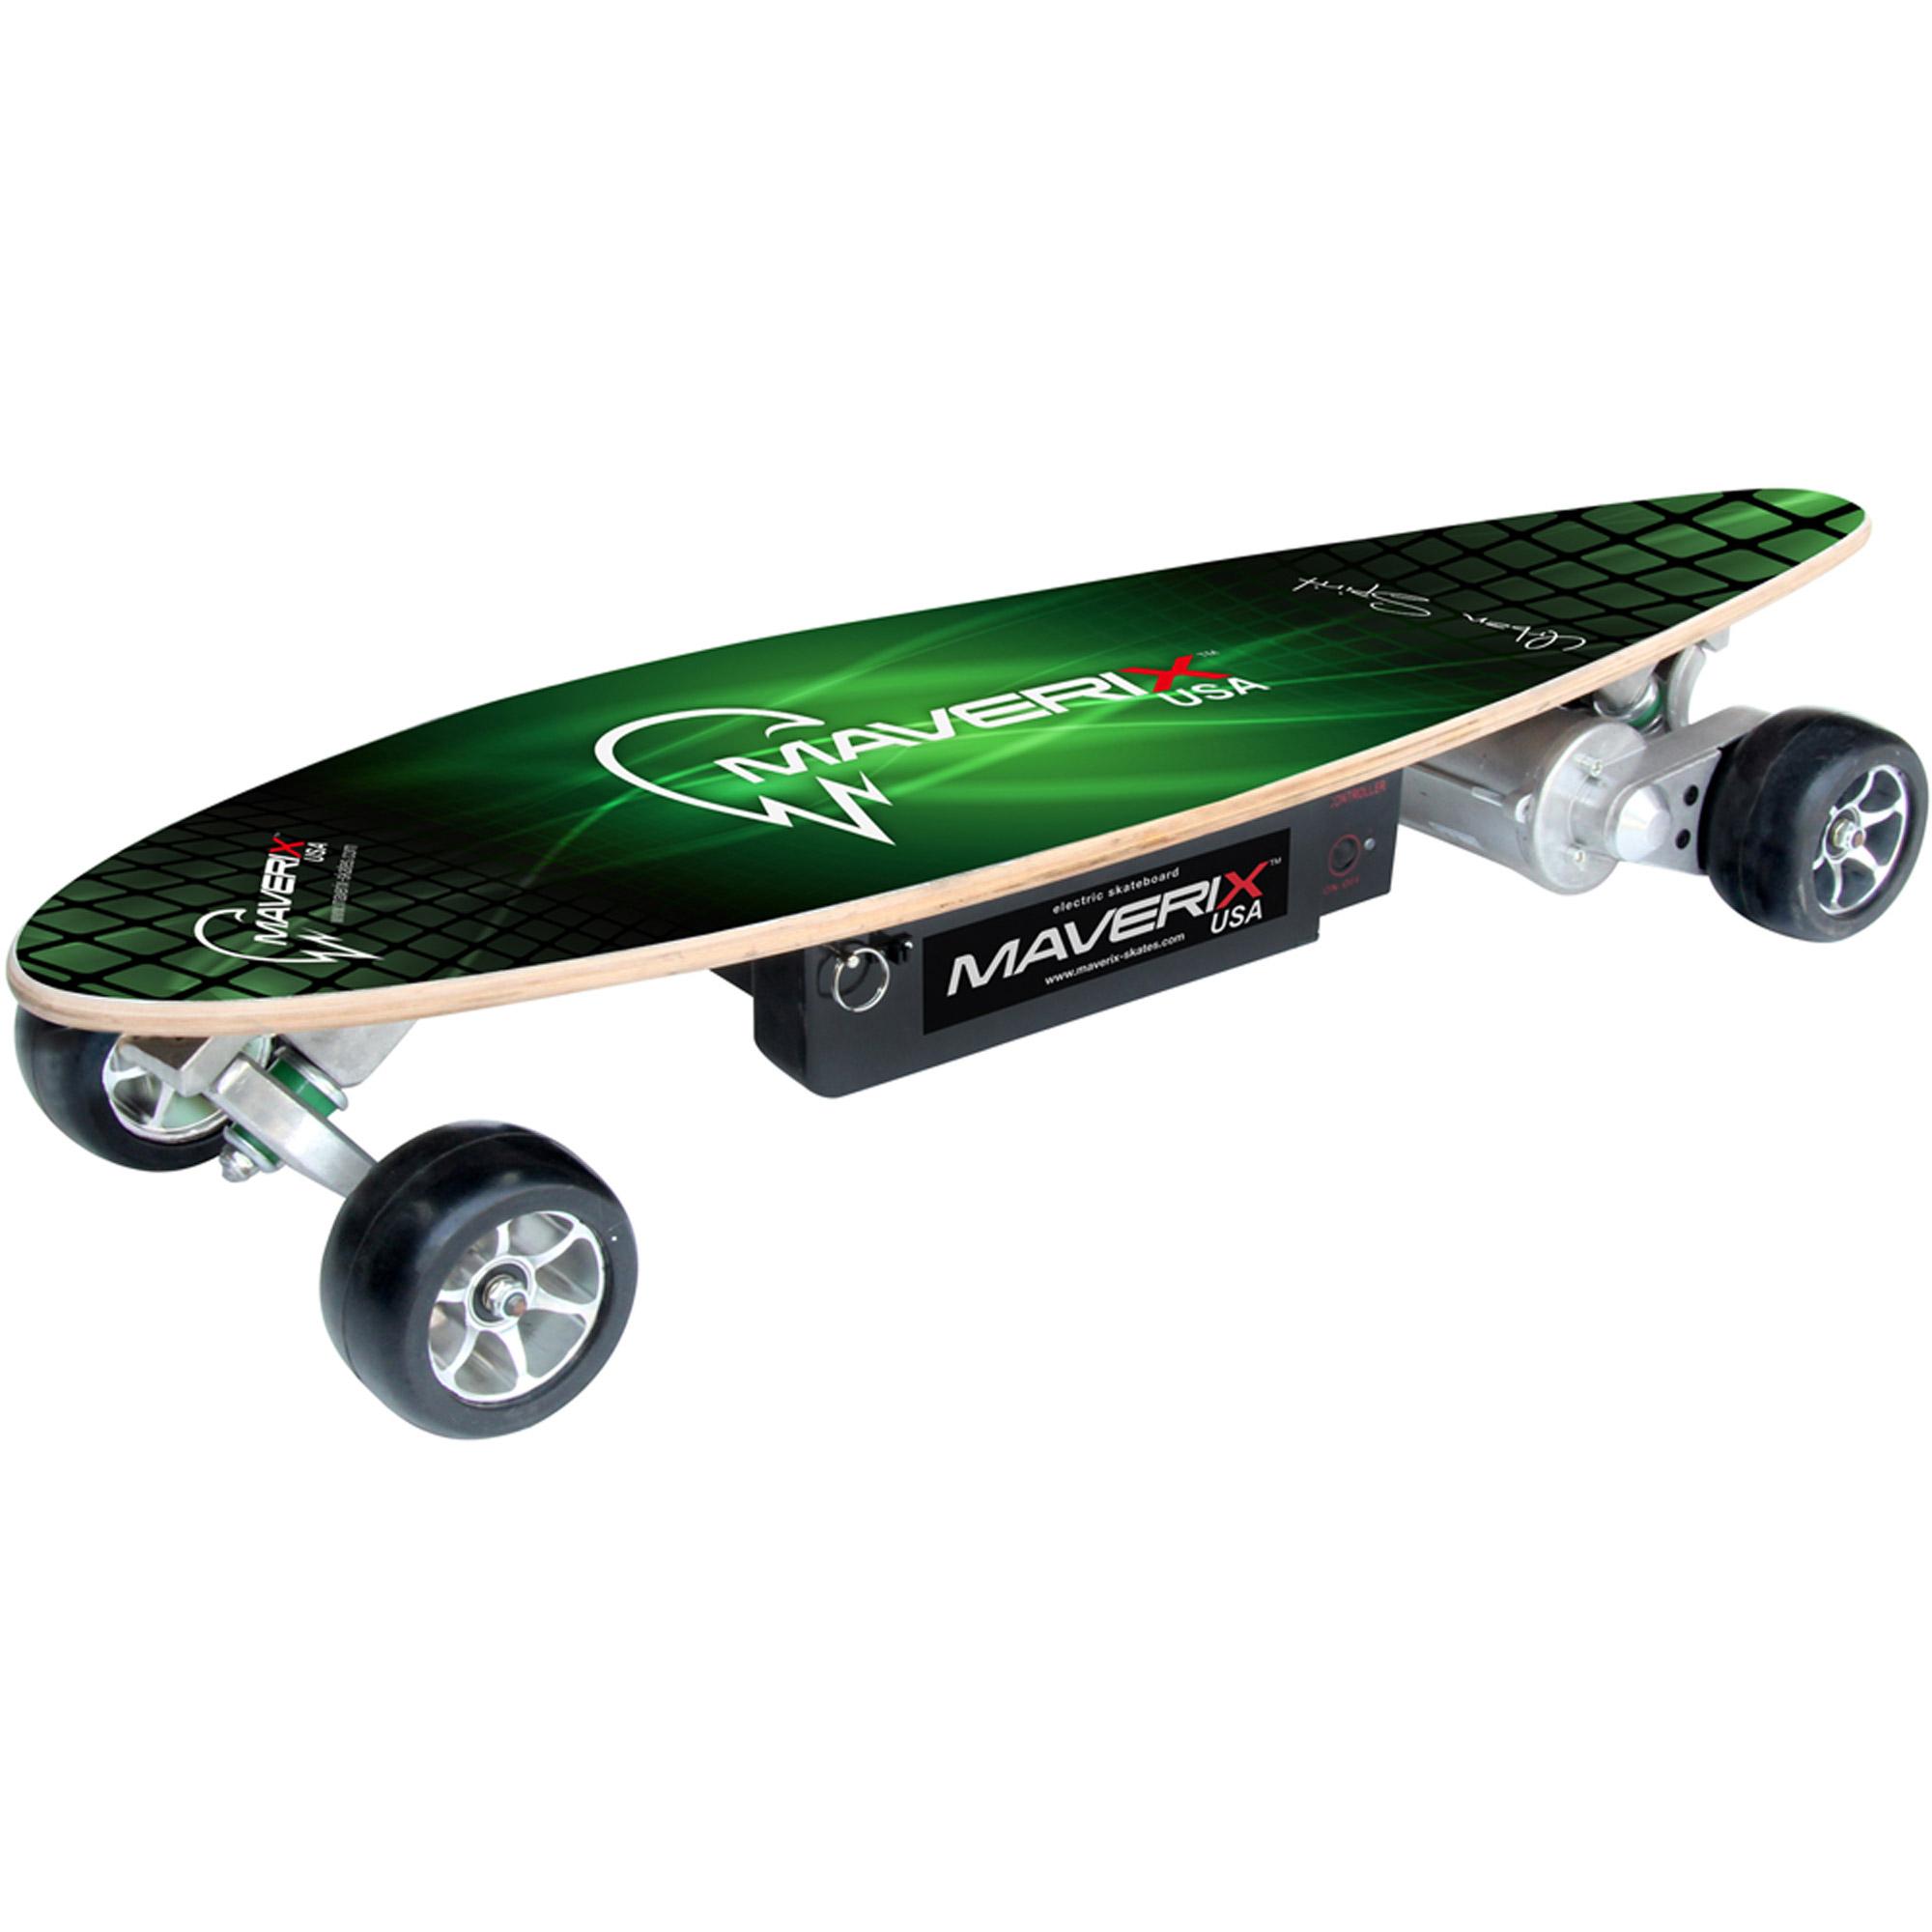 Maverix  California Electric Skateboard  Yellow Price Tracking